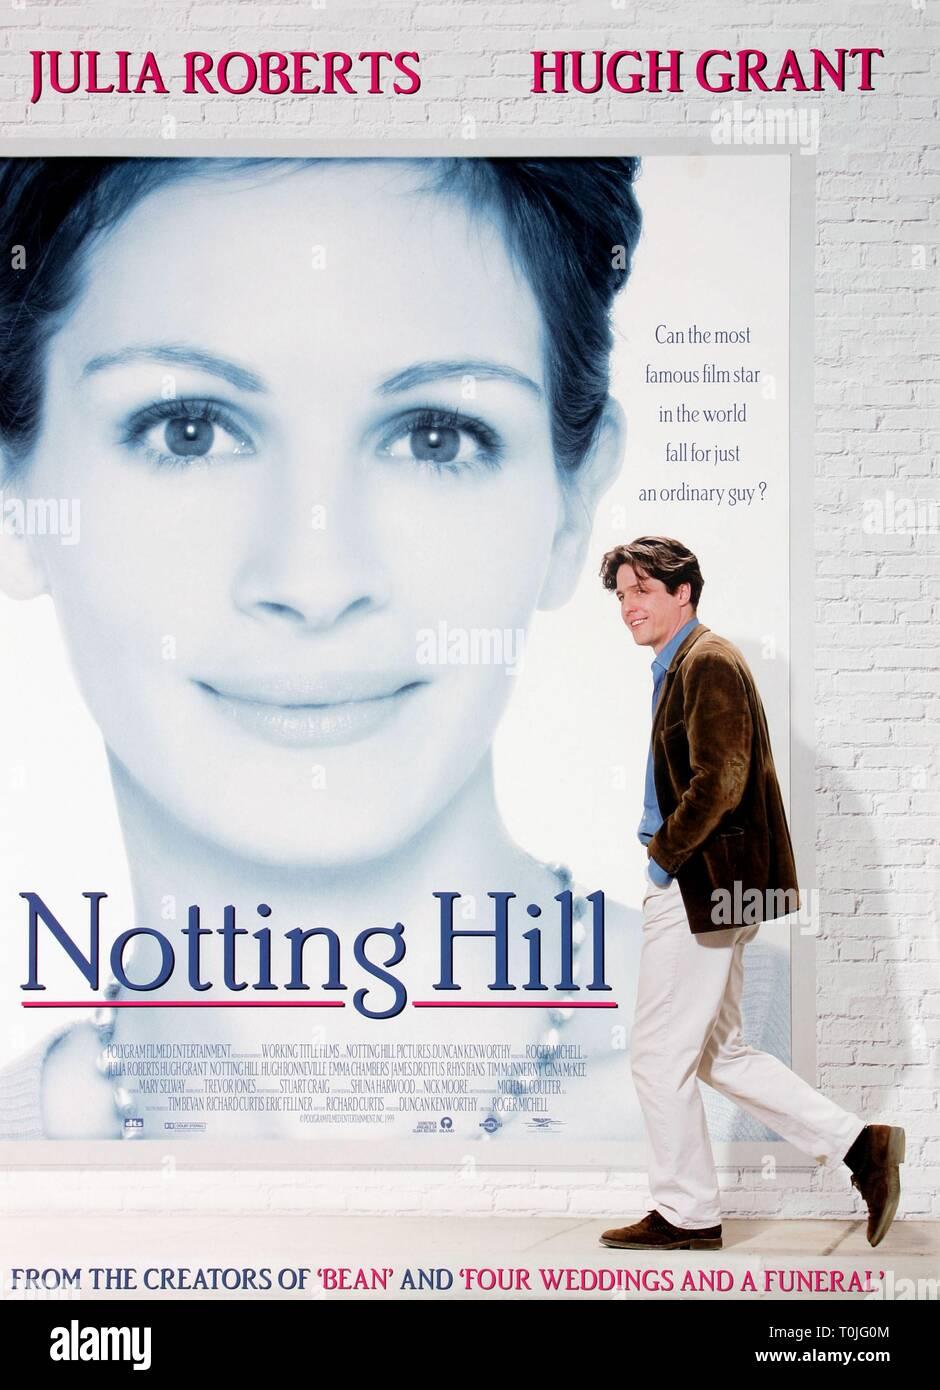 JULIA ROBERTS, HUGH GRANT POSTER, NOTTING HILL, 1999 - Stock Image